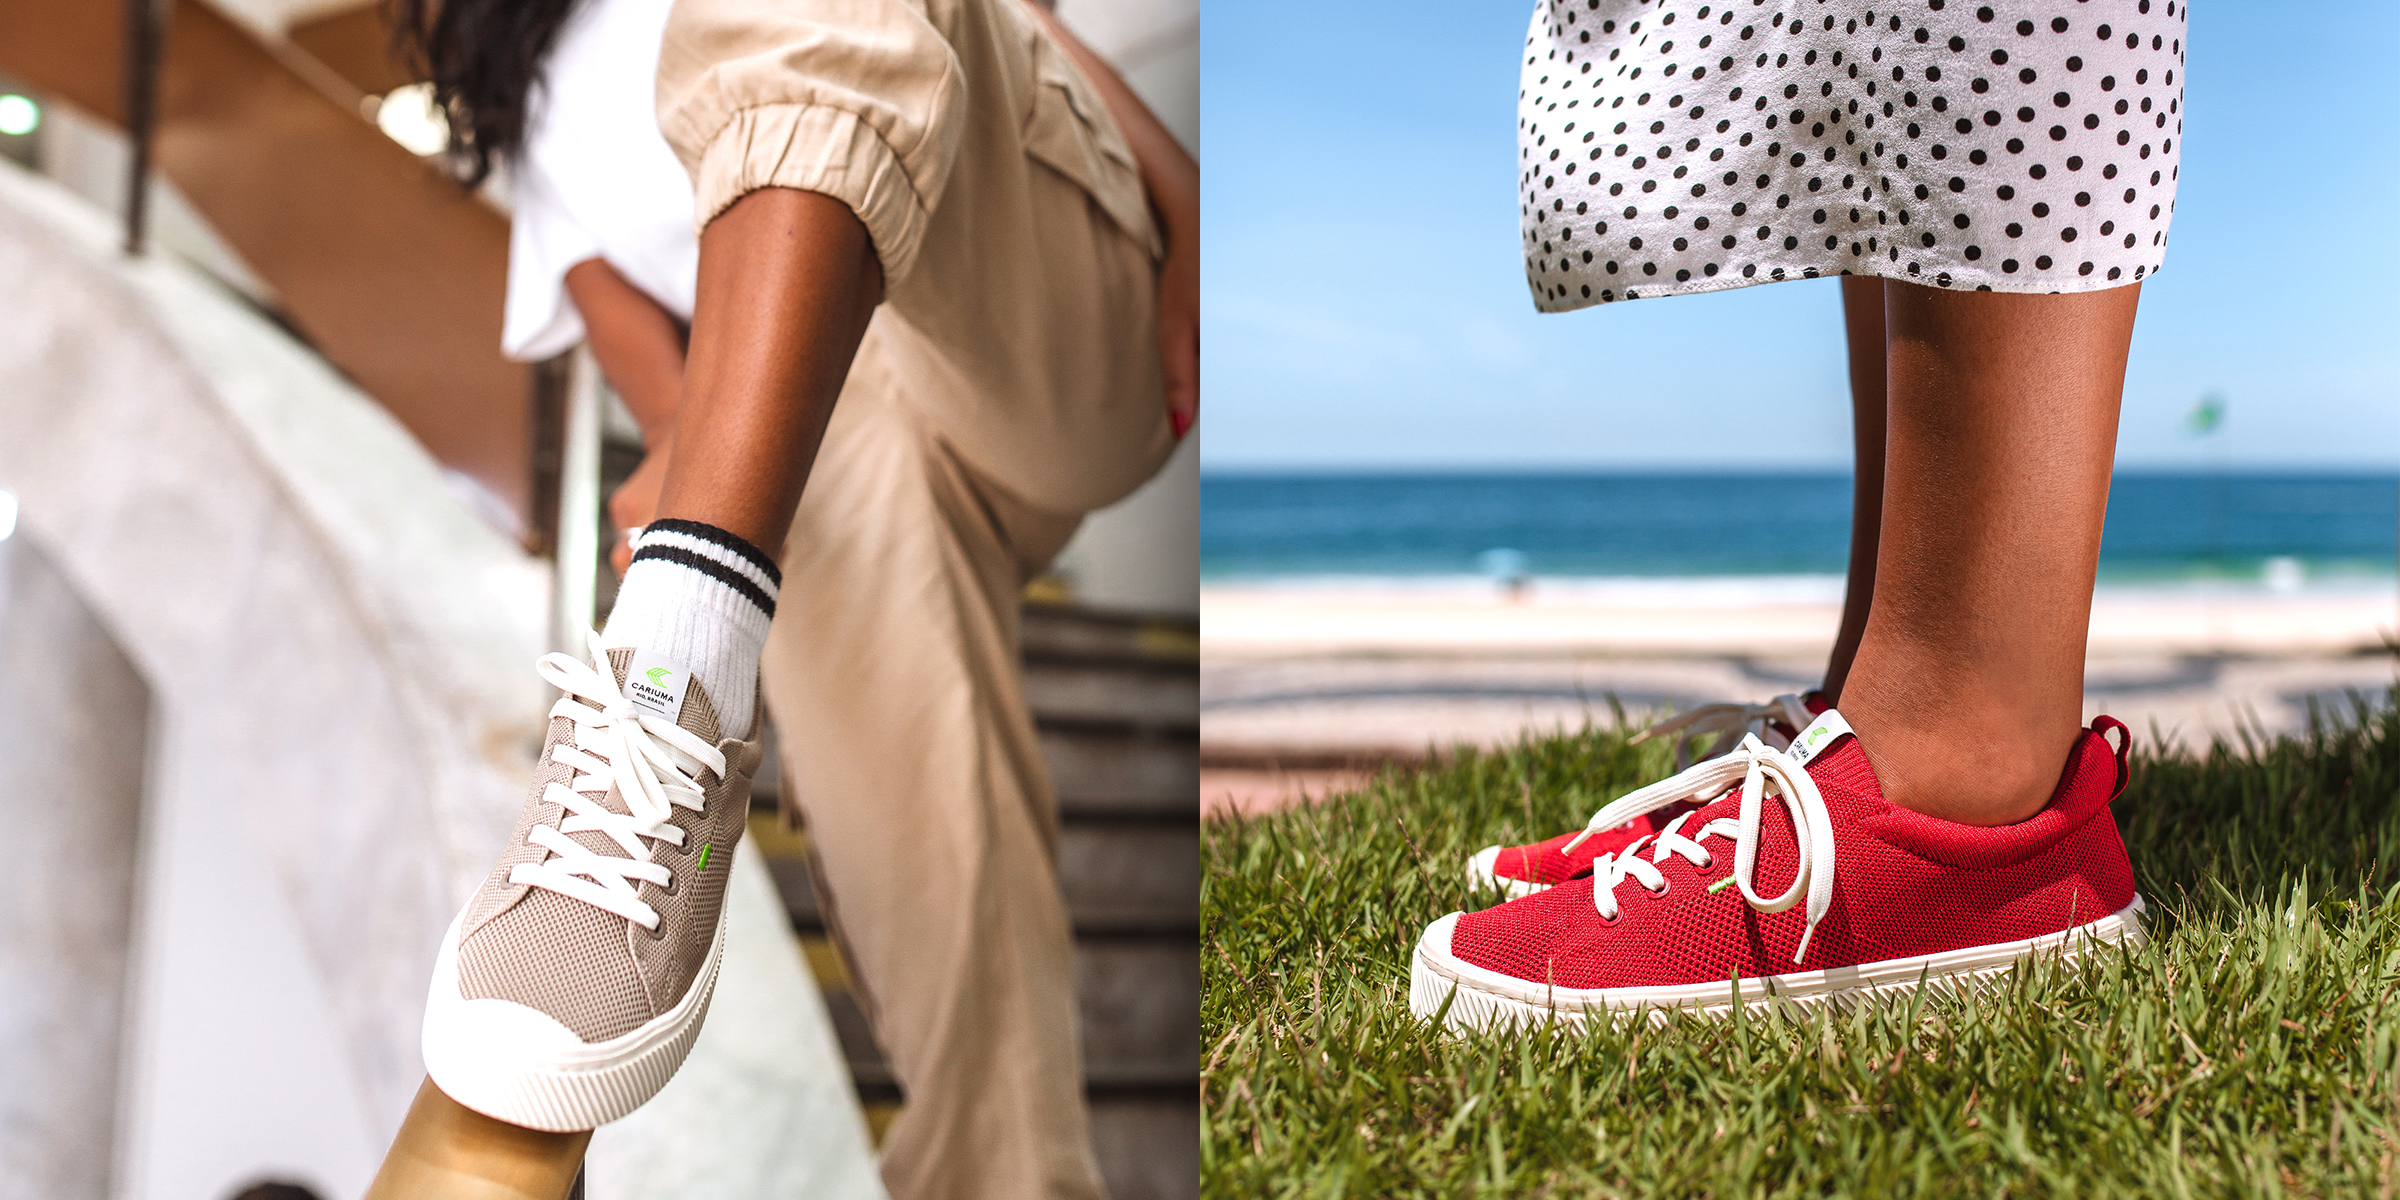 The popular Cariuma Ibi sneakers are